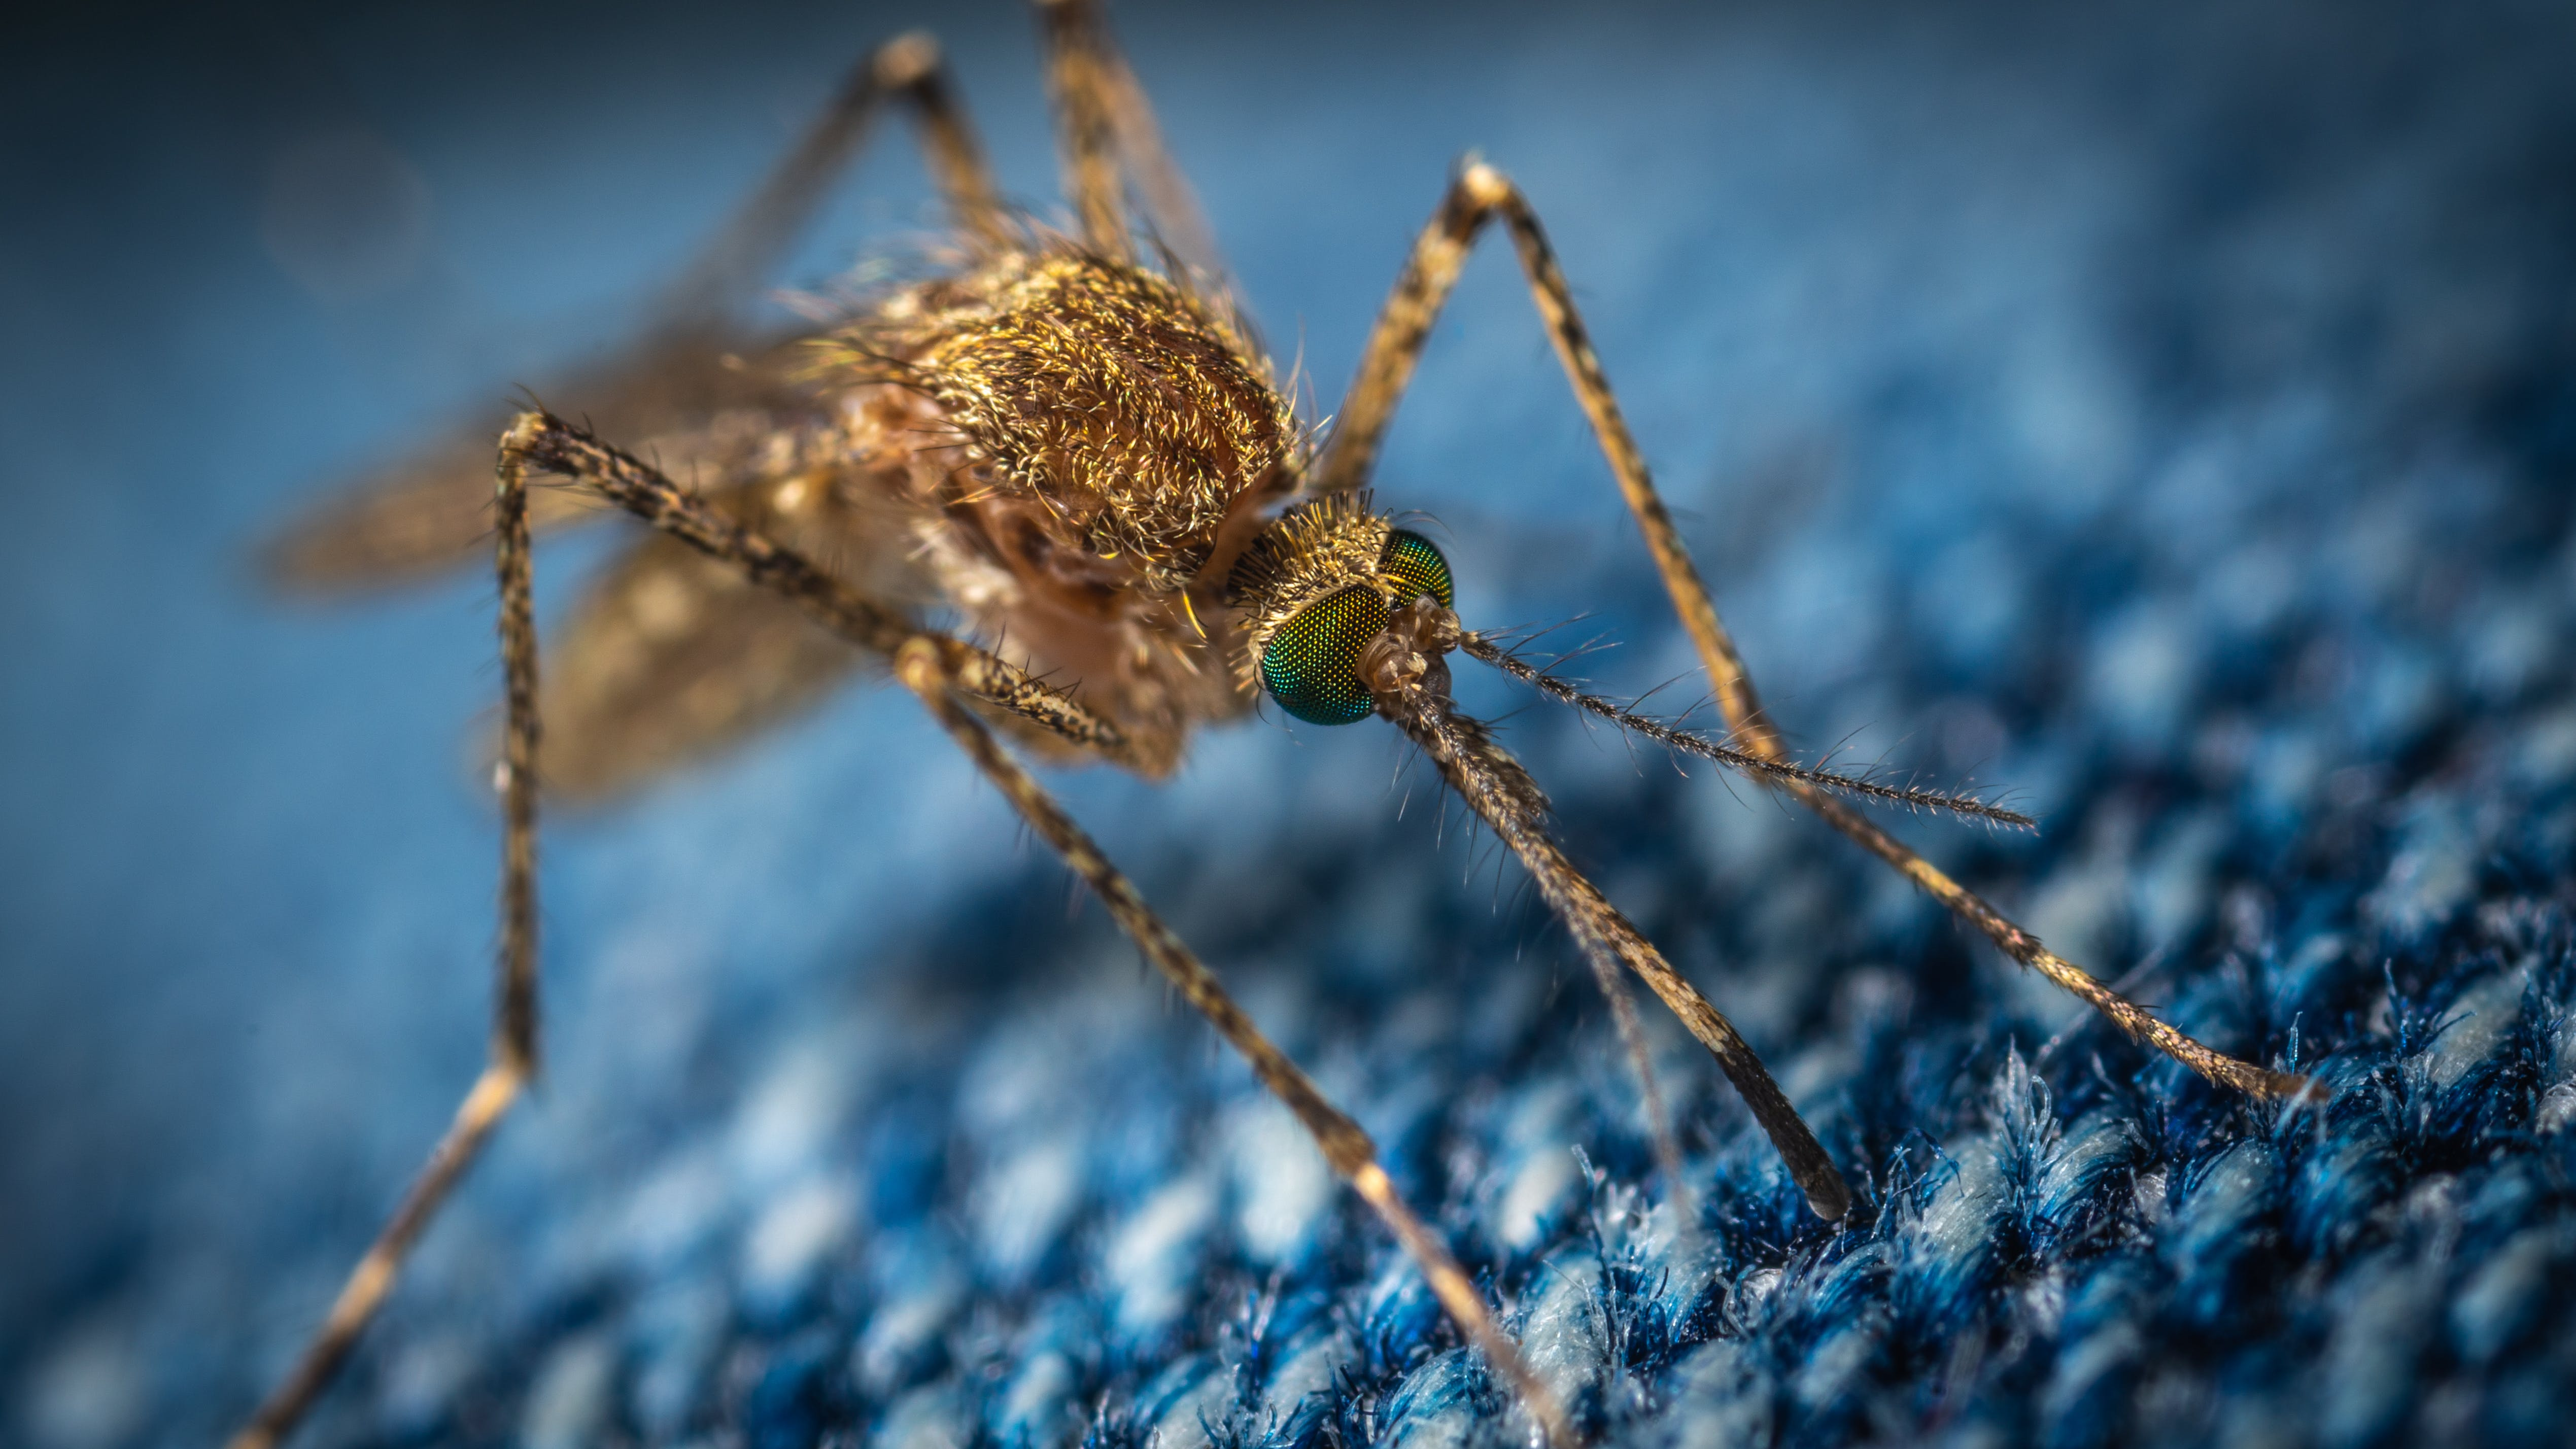 Foto stok gratis fotografi makro, hama, ilmu serangga, invertebrata